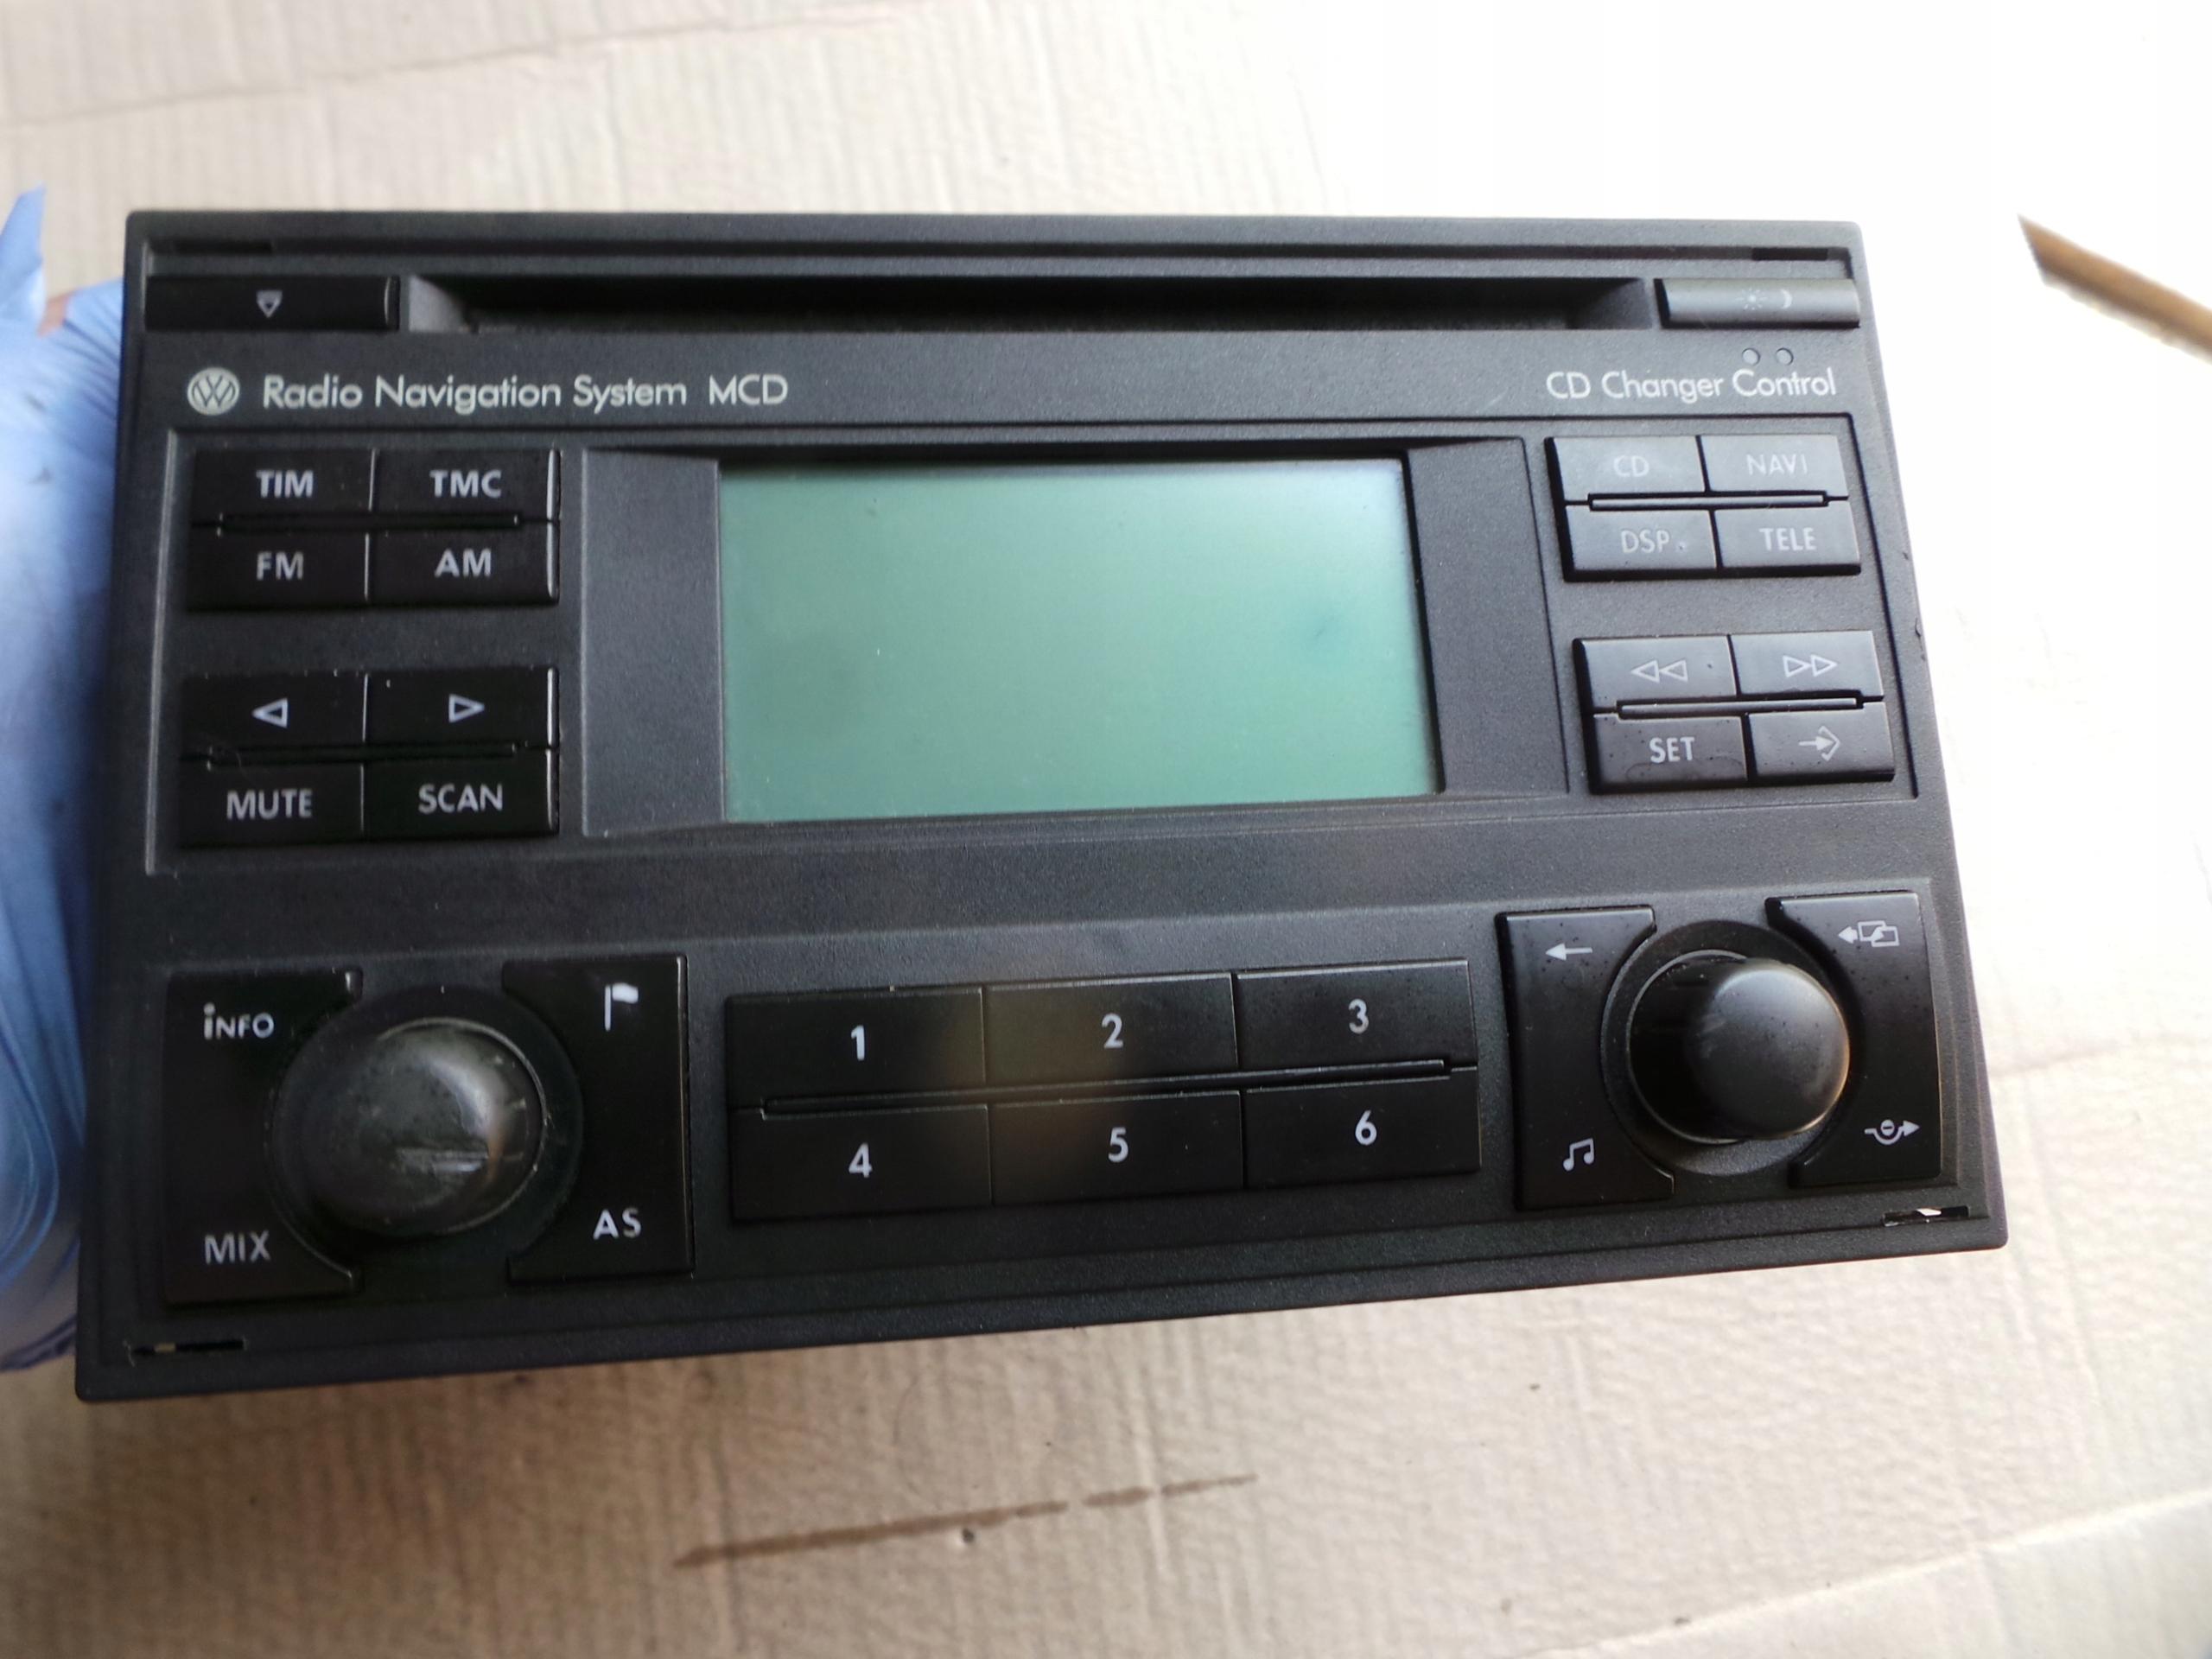 радио навигация vw passat b5fl